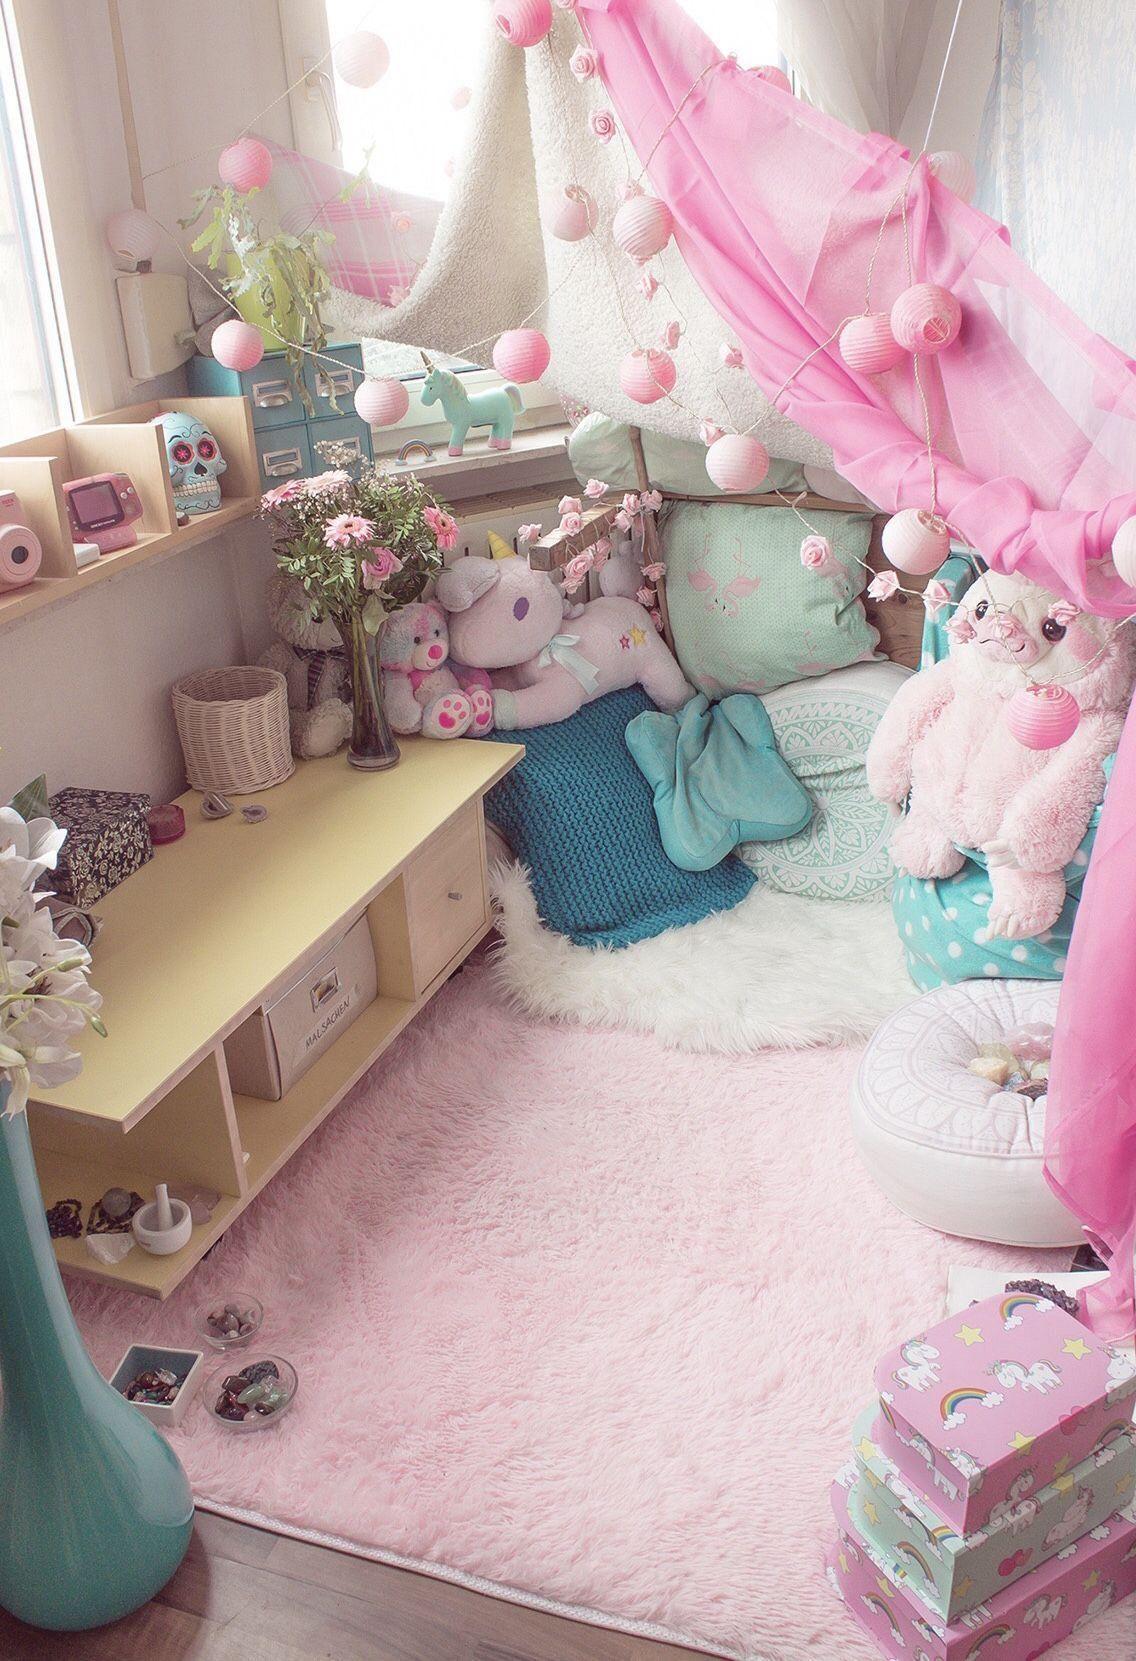 12 Dcoration Chambre Kawaii   Girl room, Cute room ideas, Kawaii ...